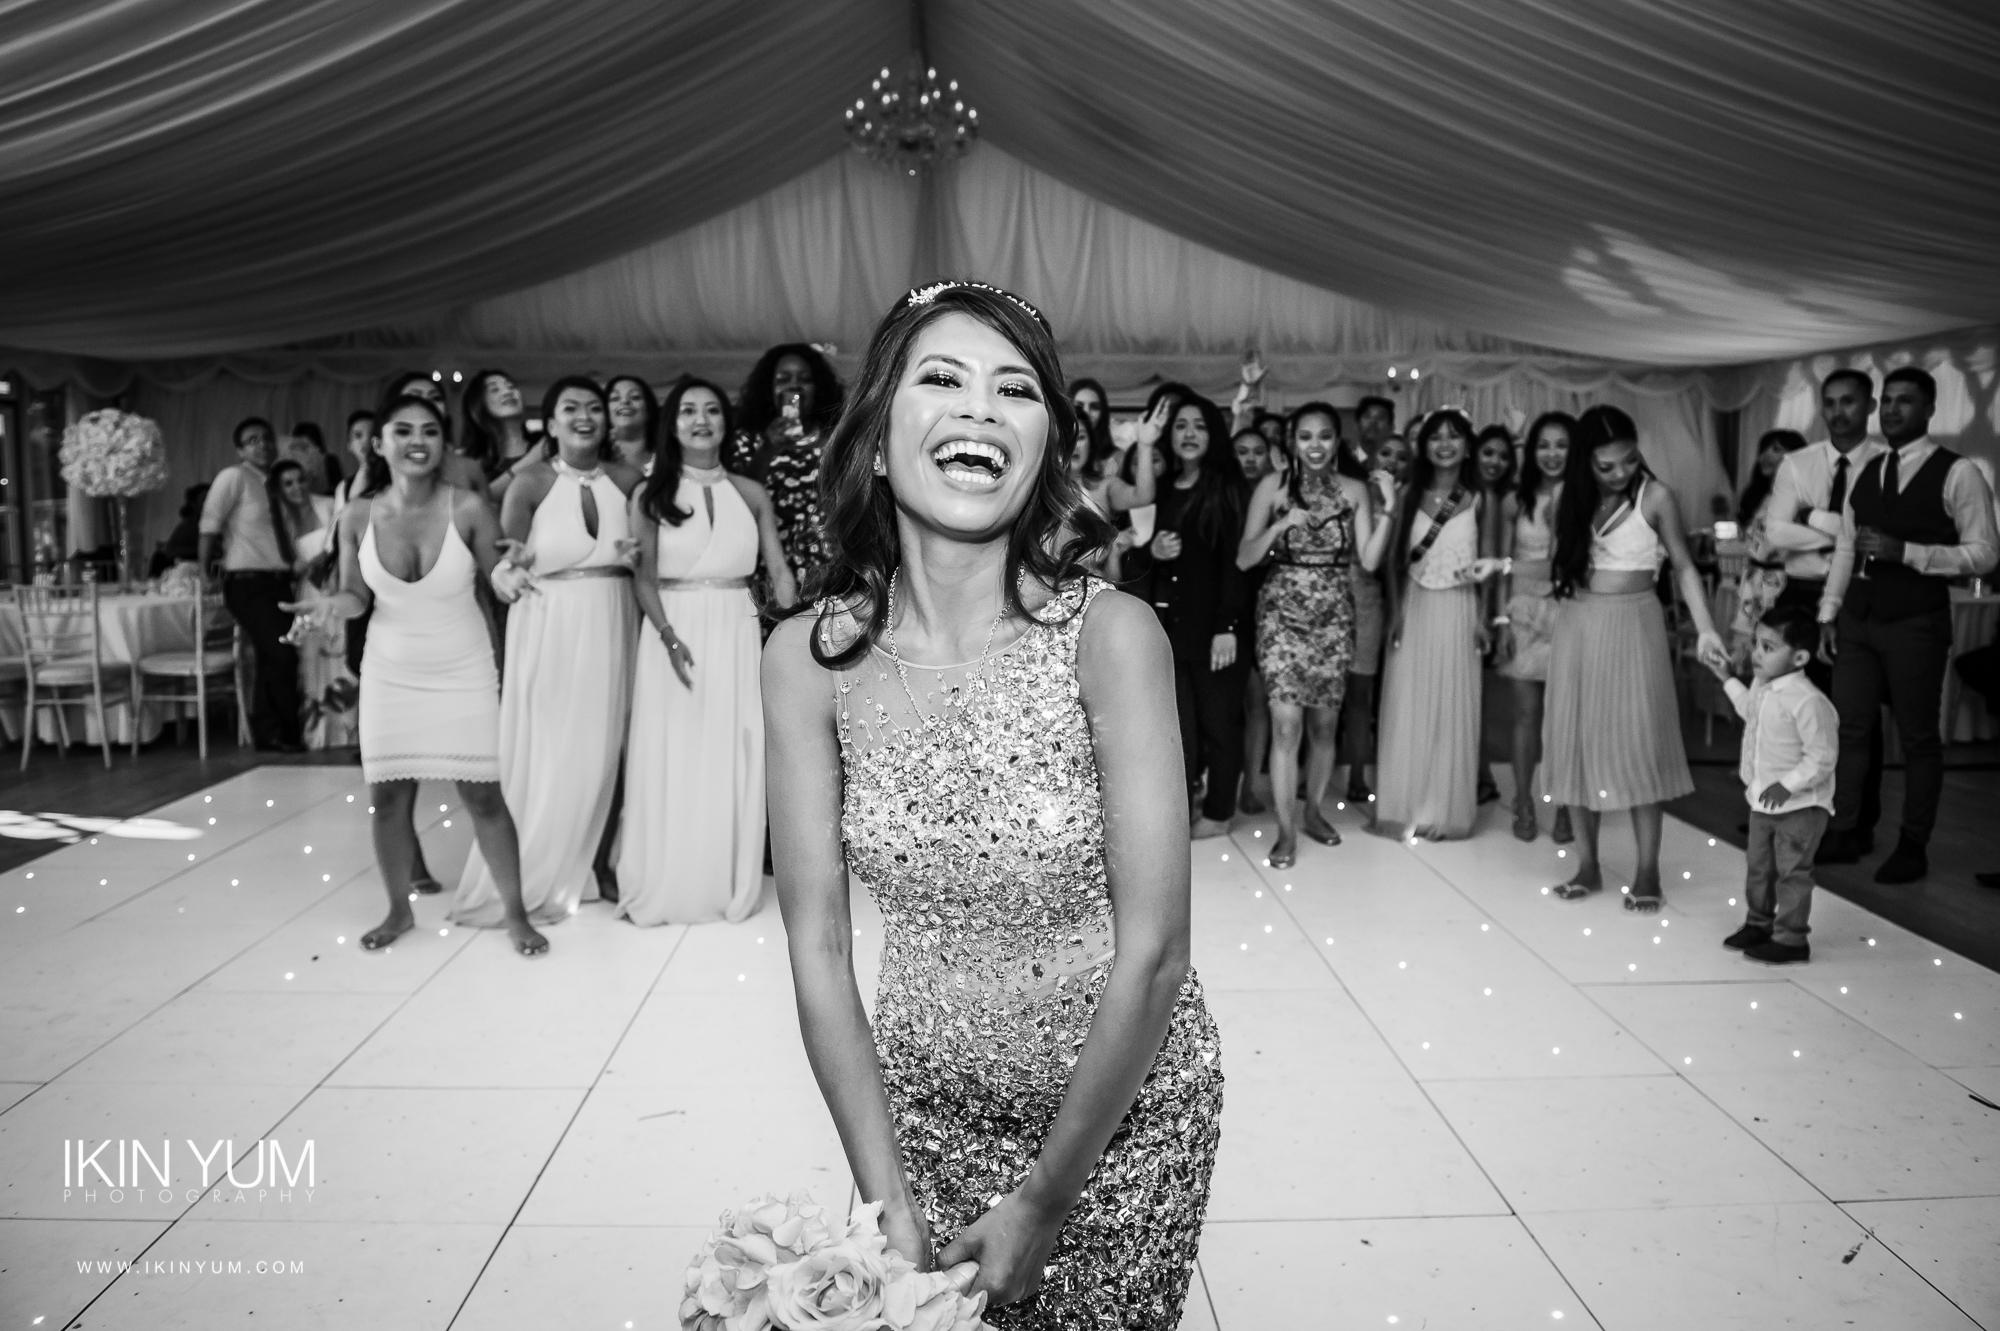 Hylands House Wedding - Ikin Yum Photography-140.jpg